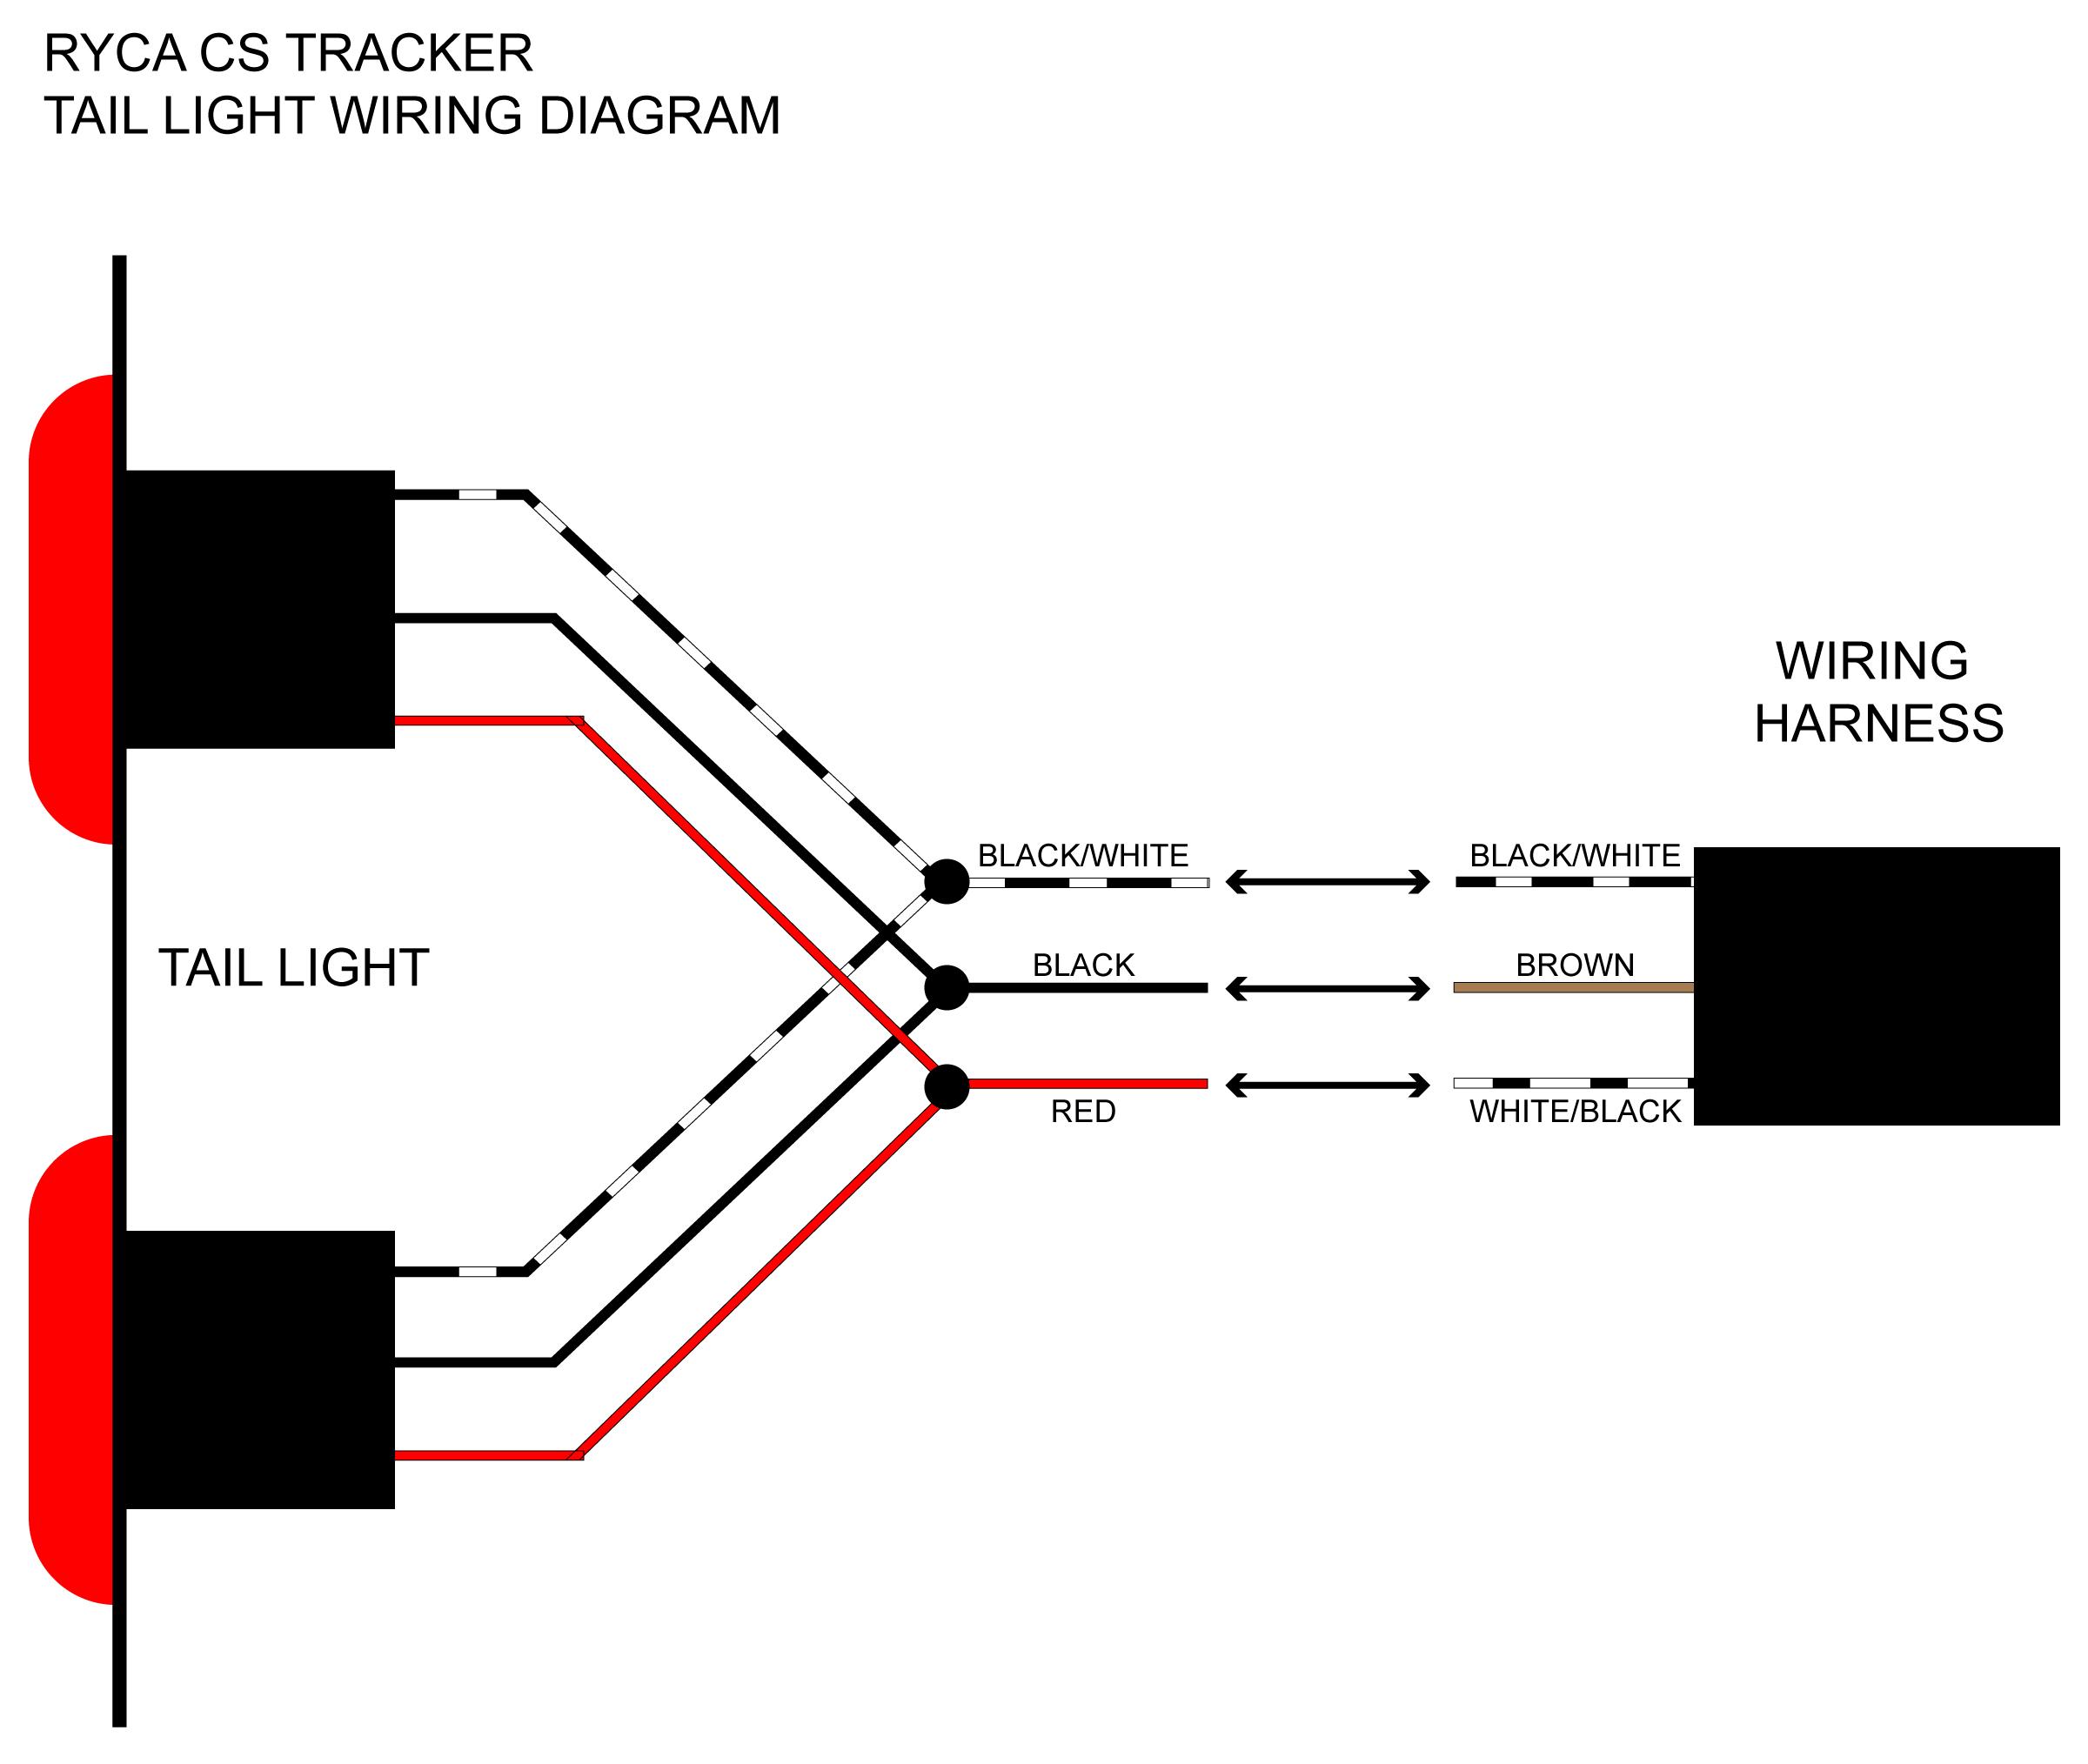 Cz 6417 Trailer Wiring Harness On 7 Blade Trailer Connector Wiring Diagram Free Diagram